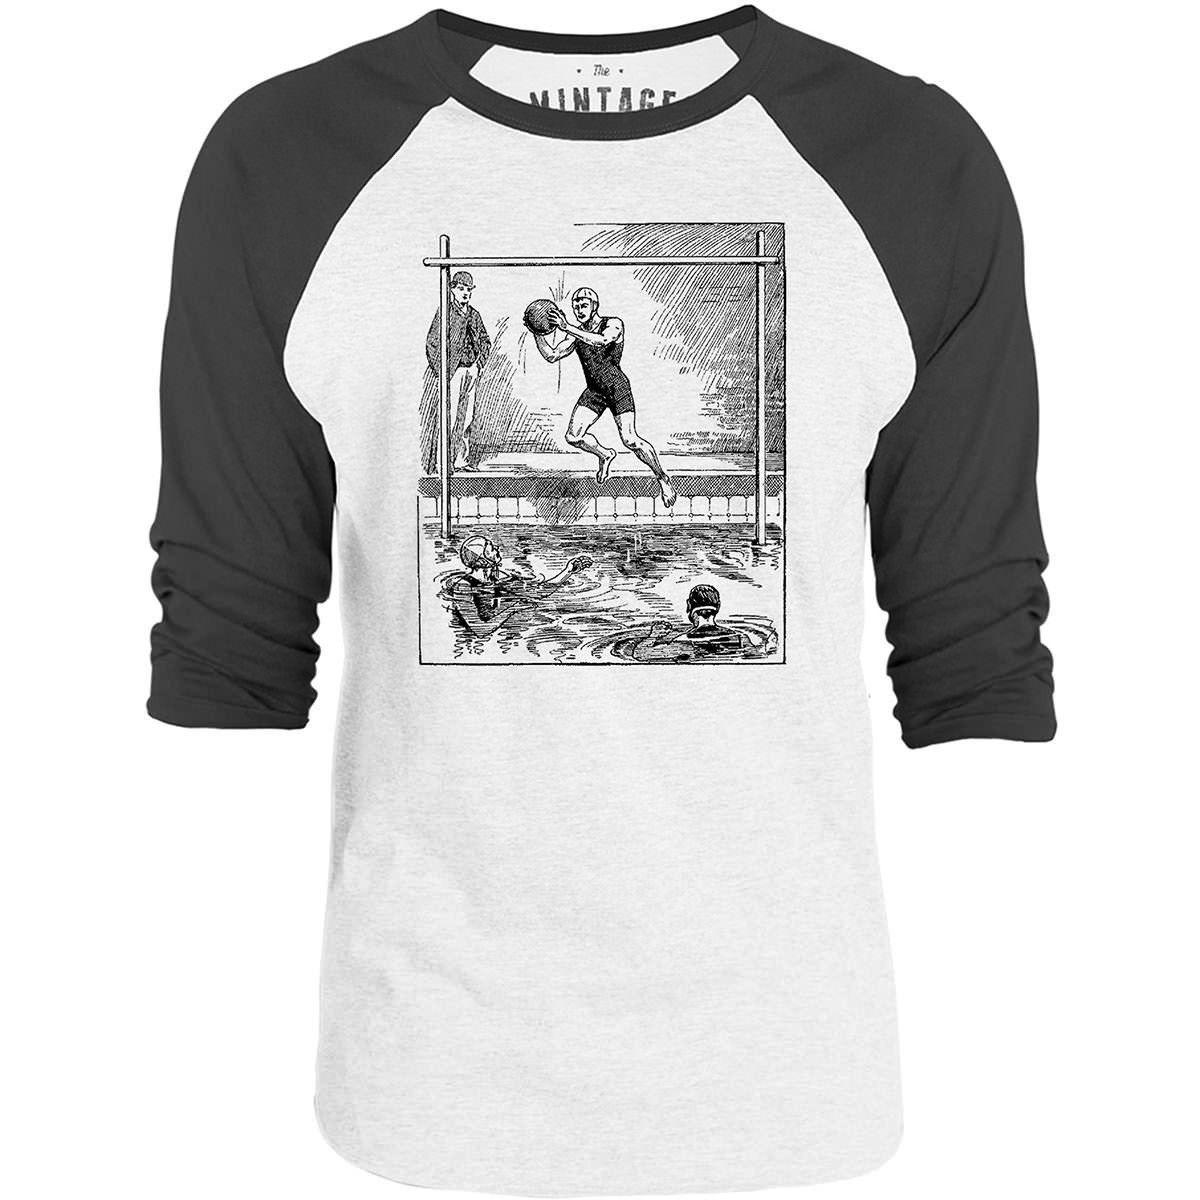 Mintage Vintage Water Polo 3/4-Sleeve Raglan Baseball T-Shirt (White / Concrete)